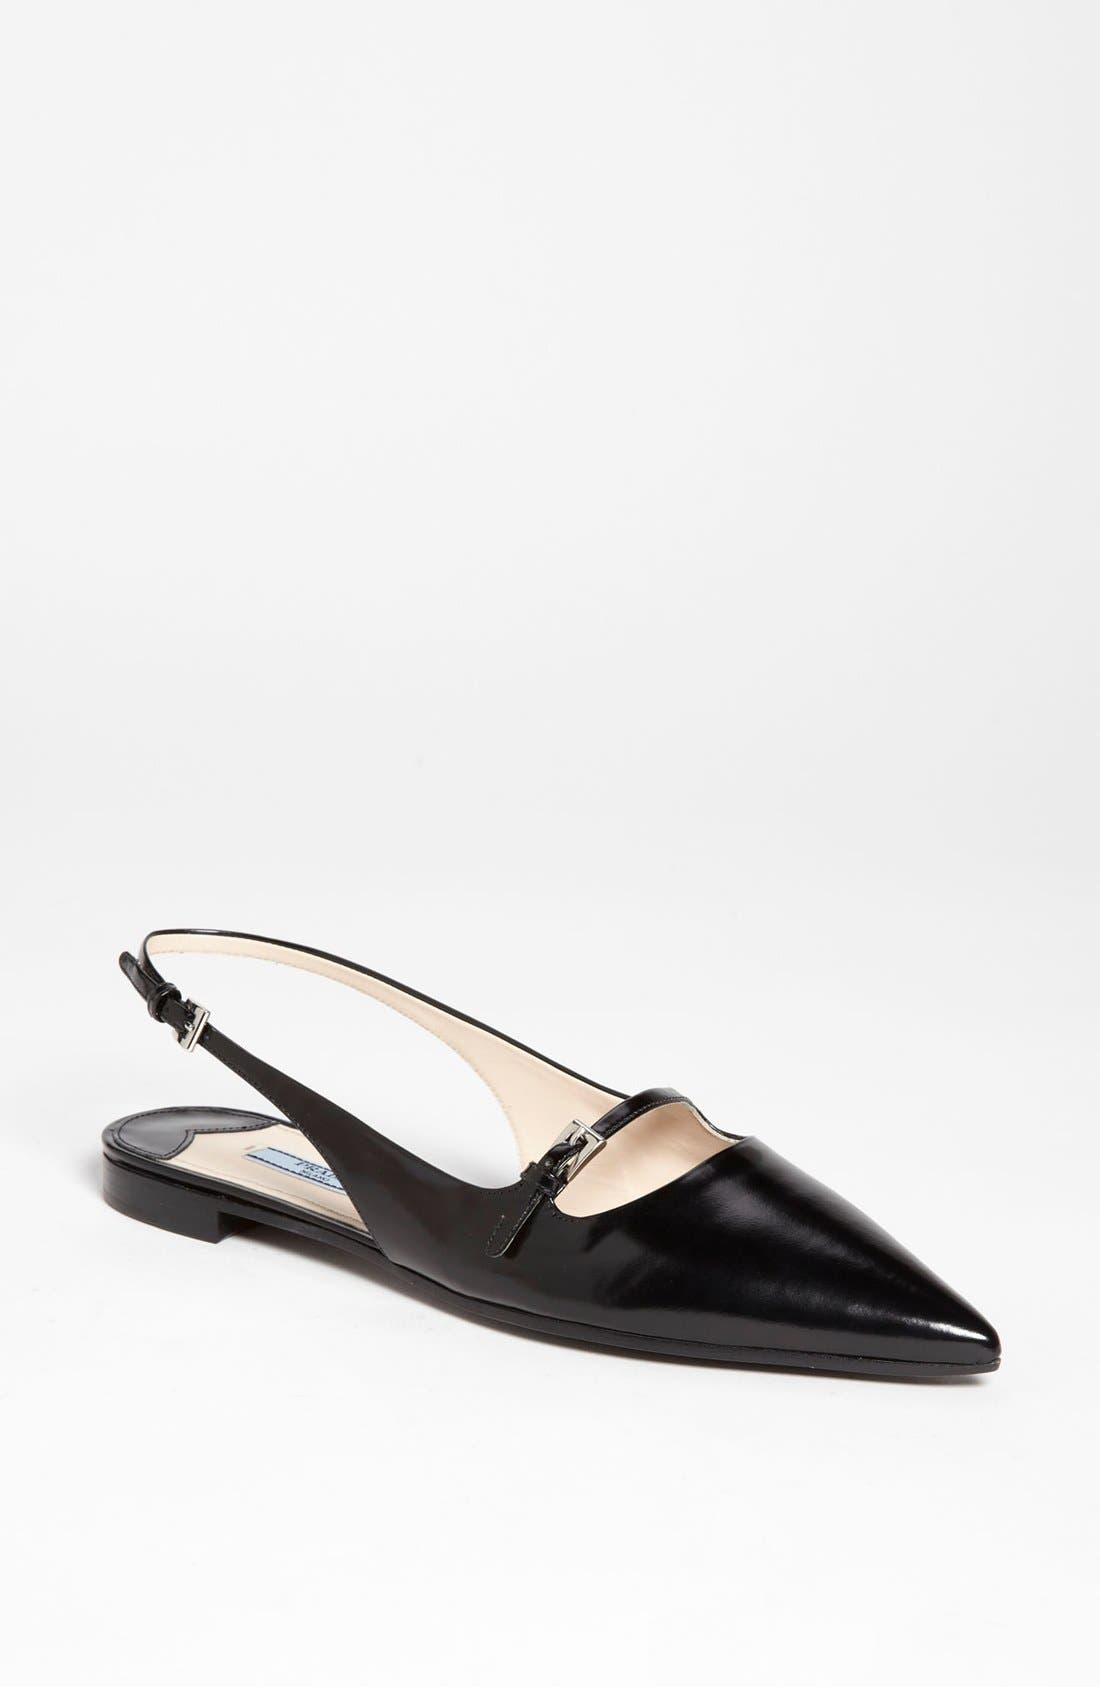 prada shoes nordstrom slingback leather purses